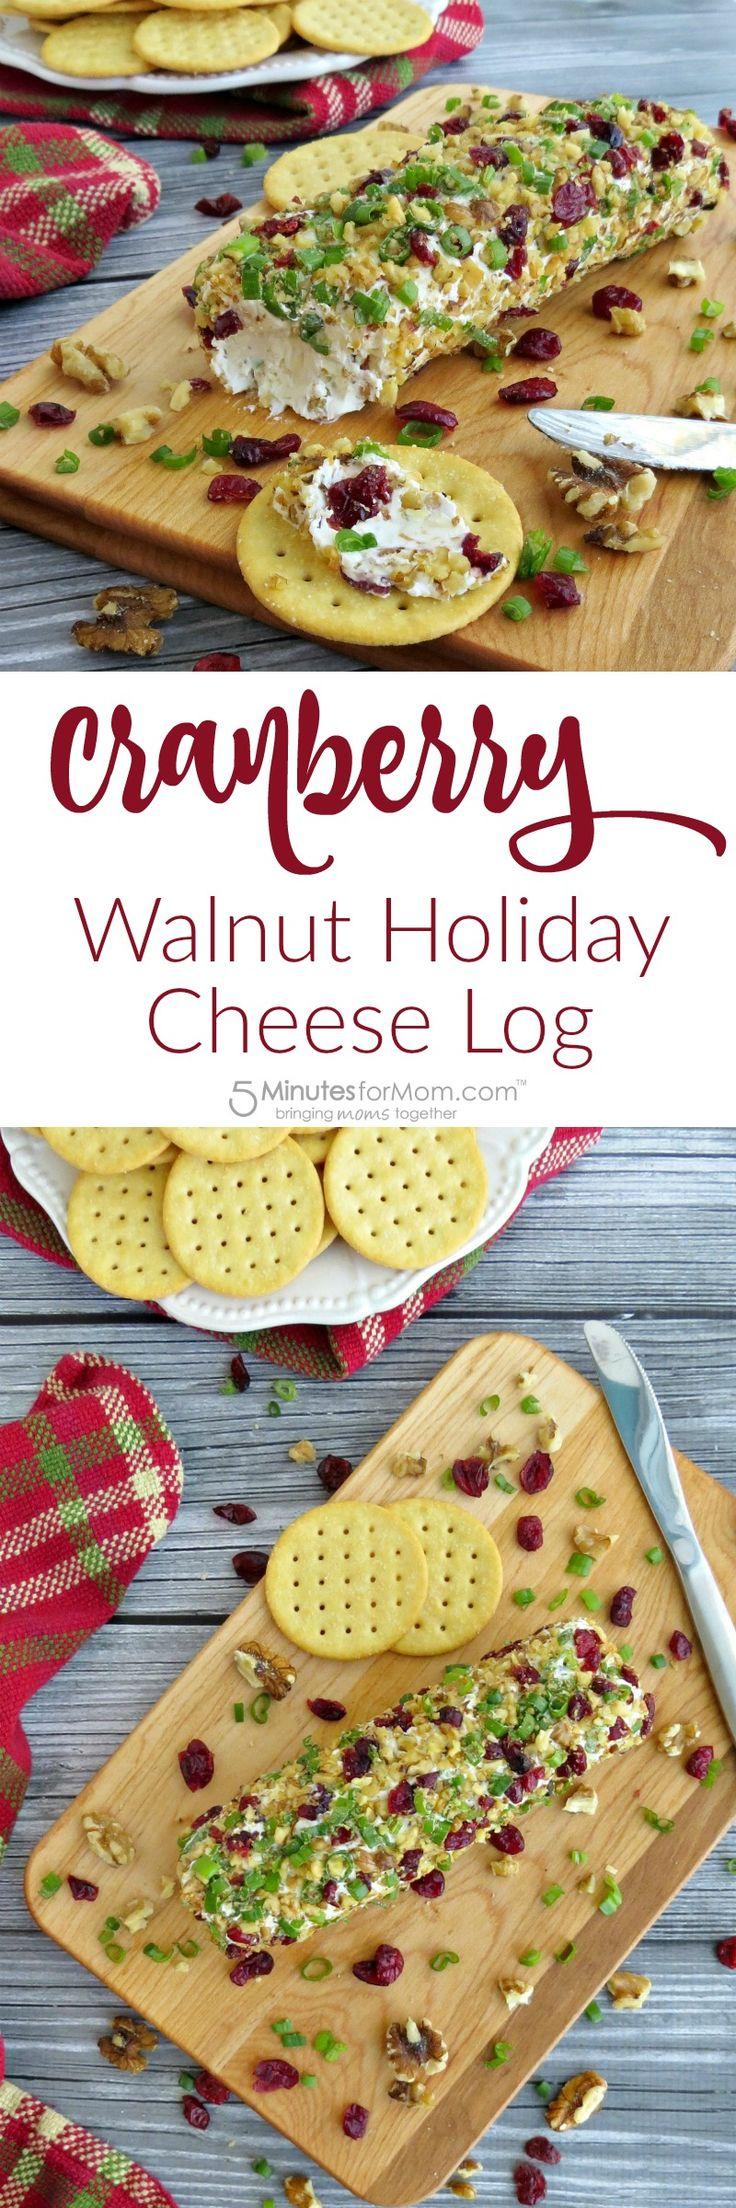 Cranberry Walnut Holiday Cheese Log Recipe